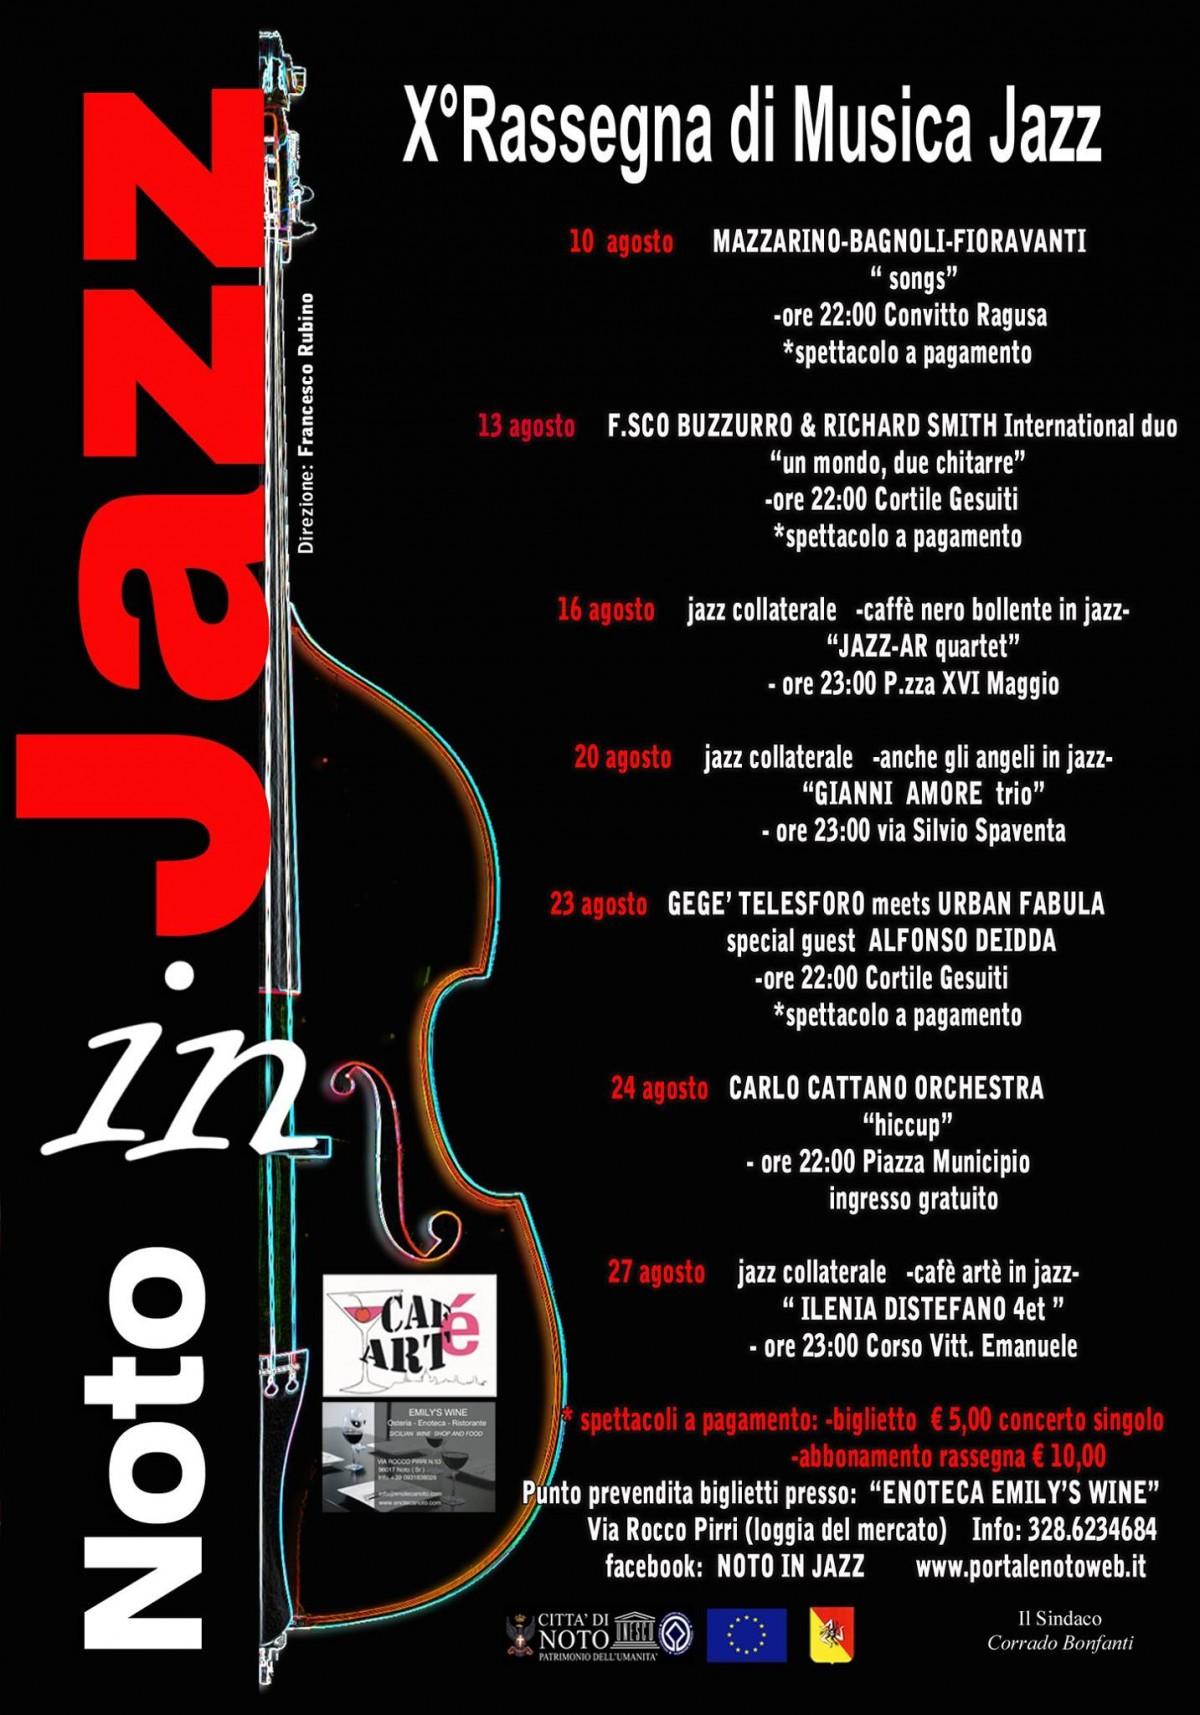 Gegè Telesforo_Alfonso Deidda_Urban Fabula_Noto in jazz